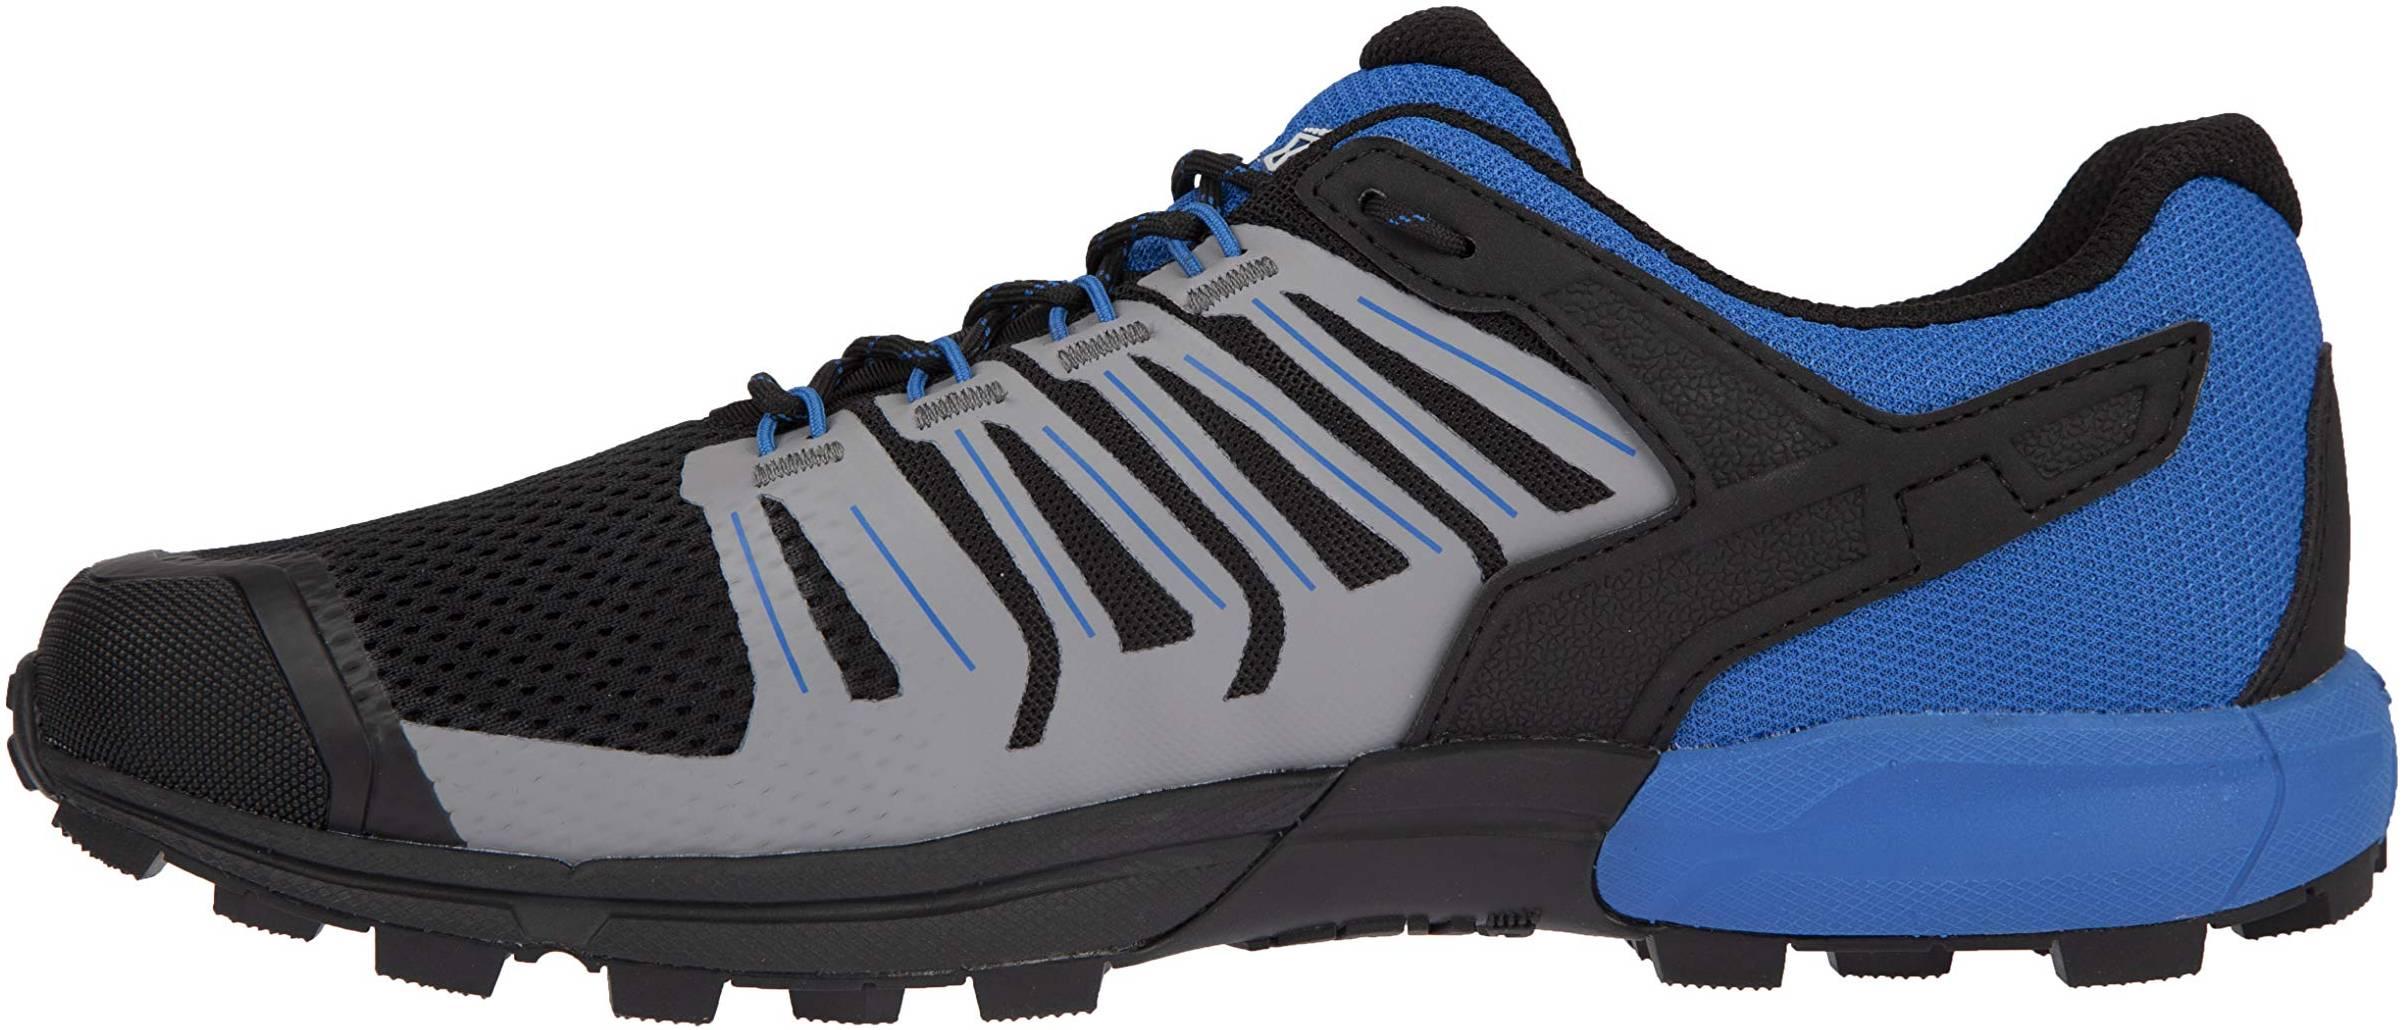 Inov-8 Neutral Running Shoes